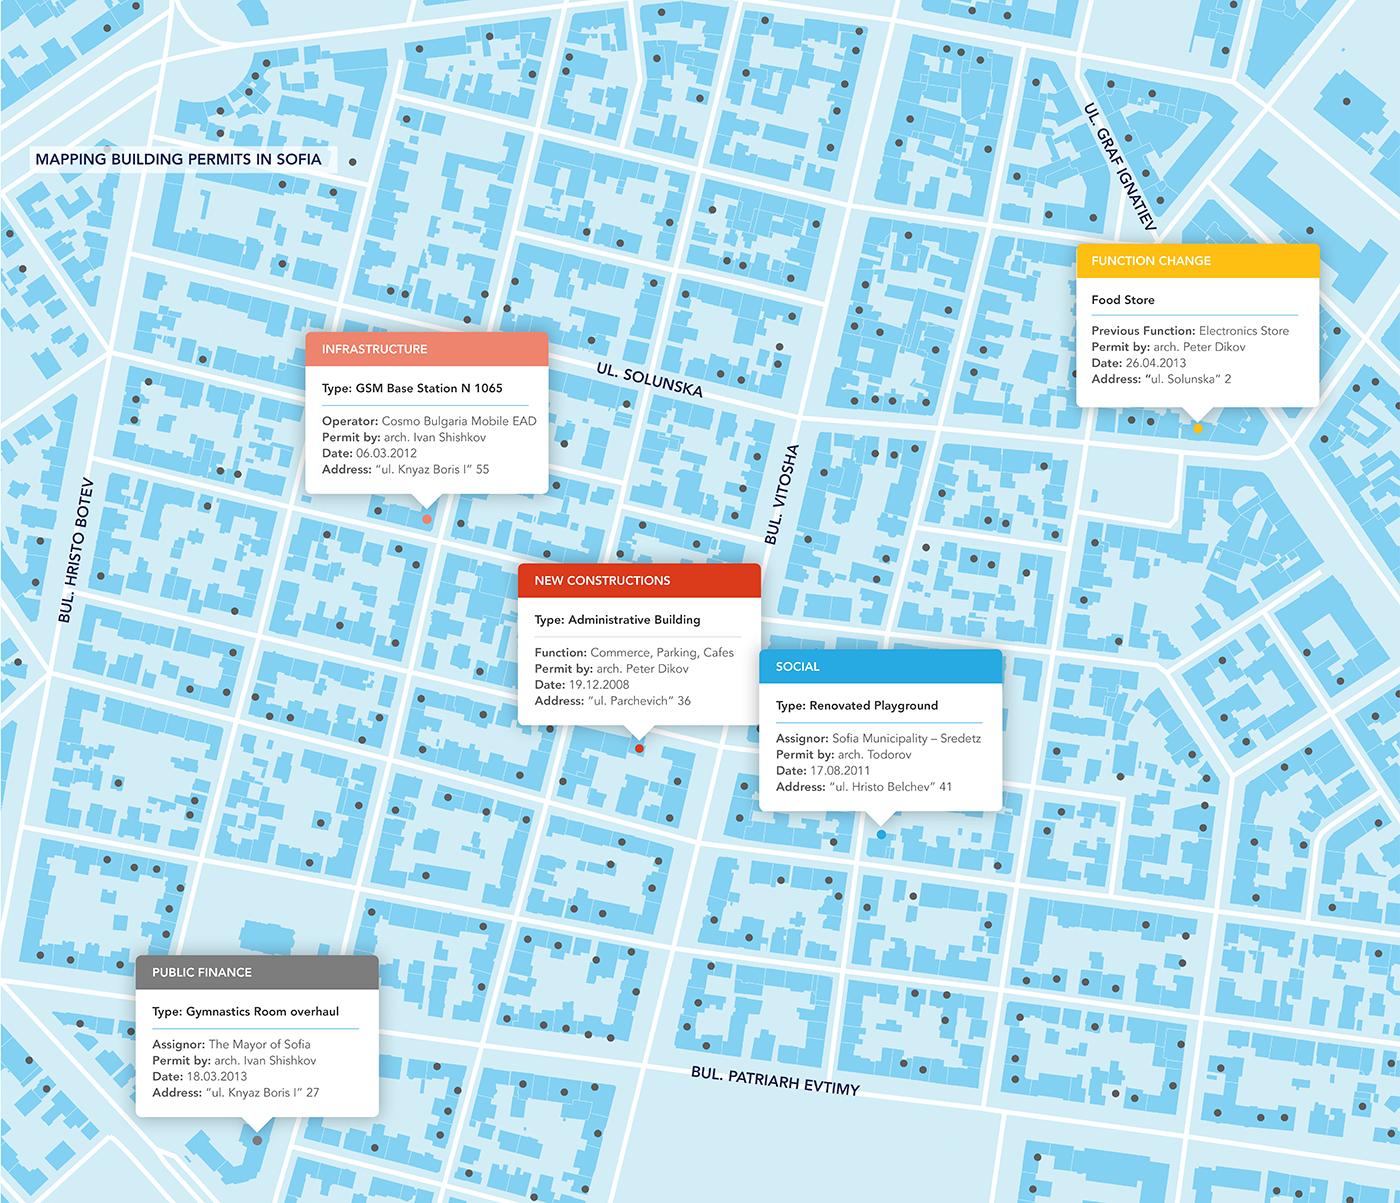 Sofia-Building-Permits-2